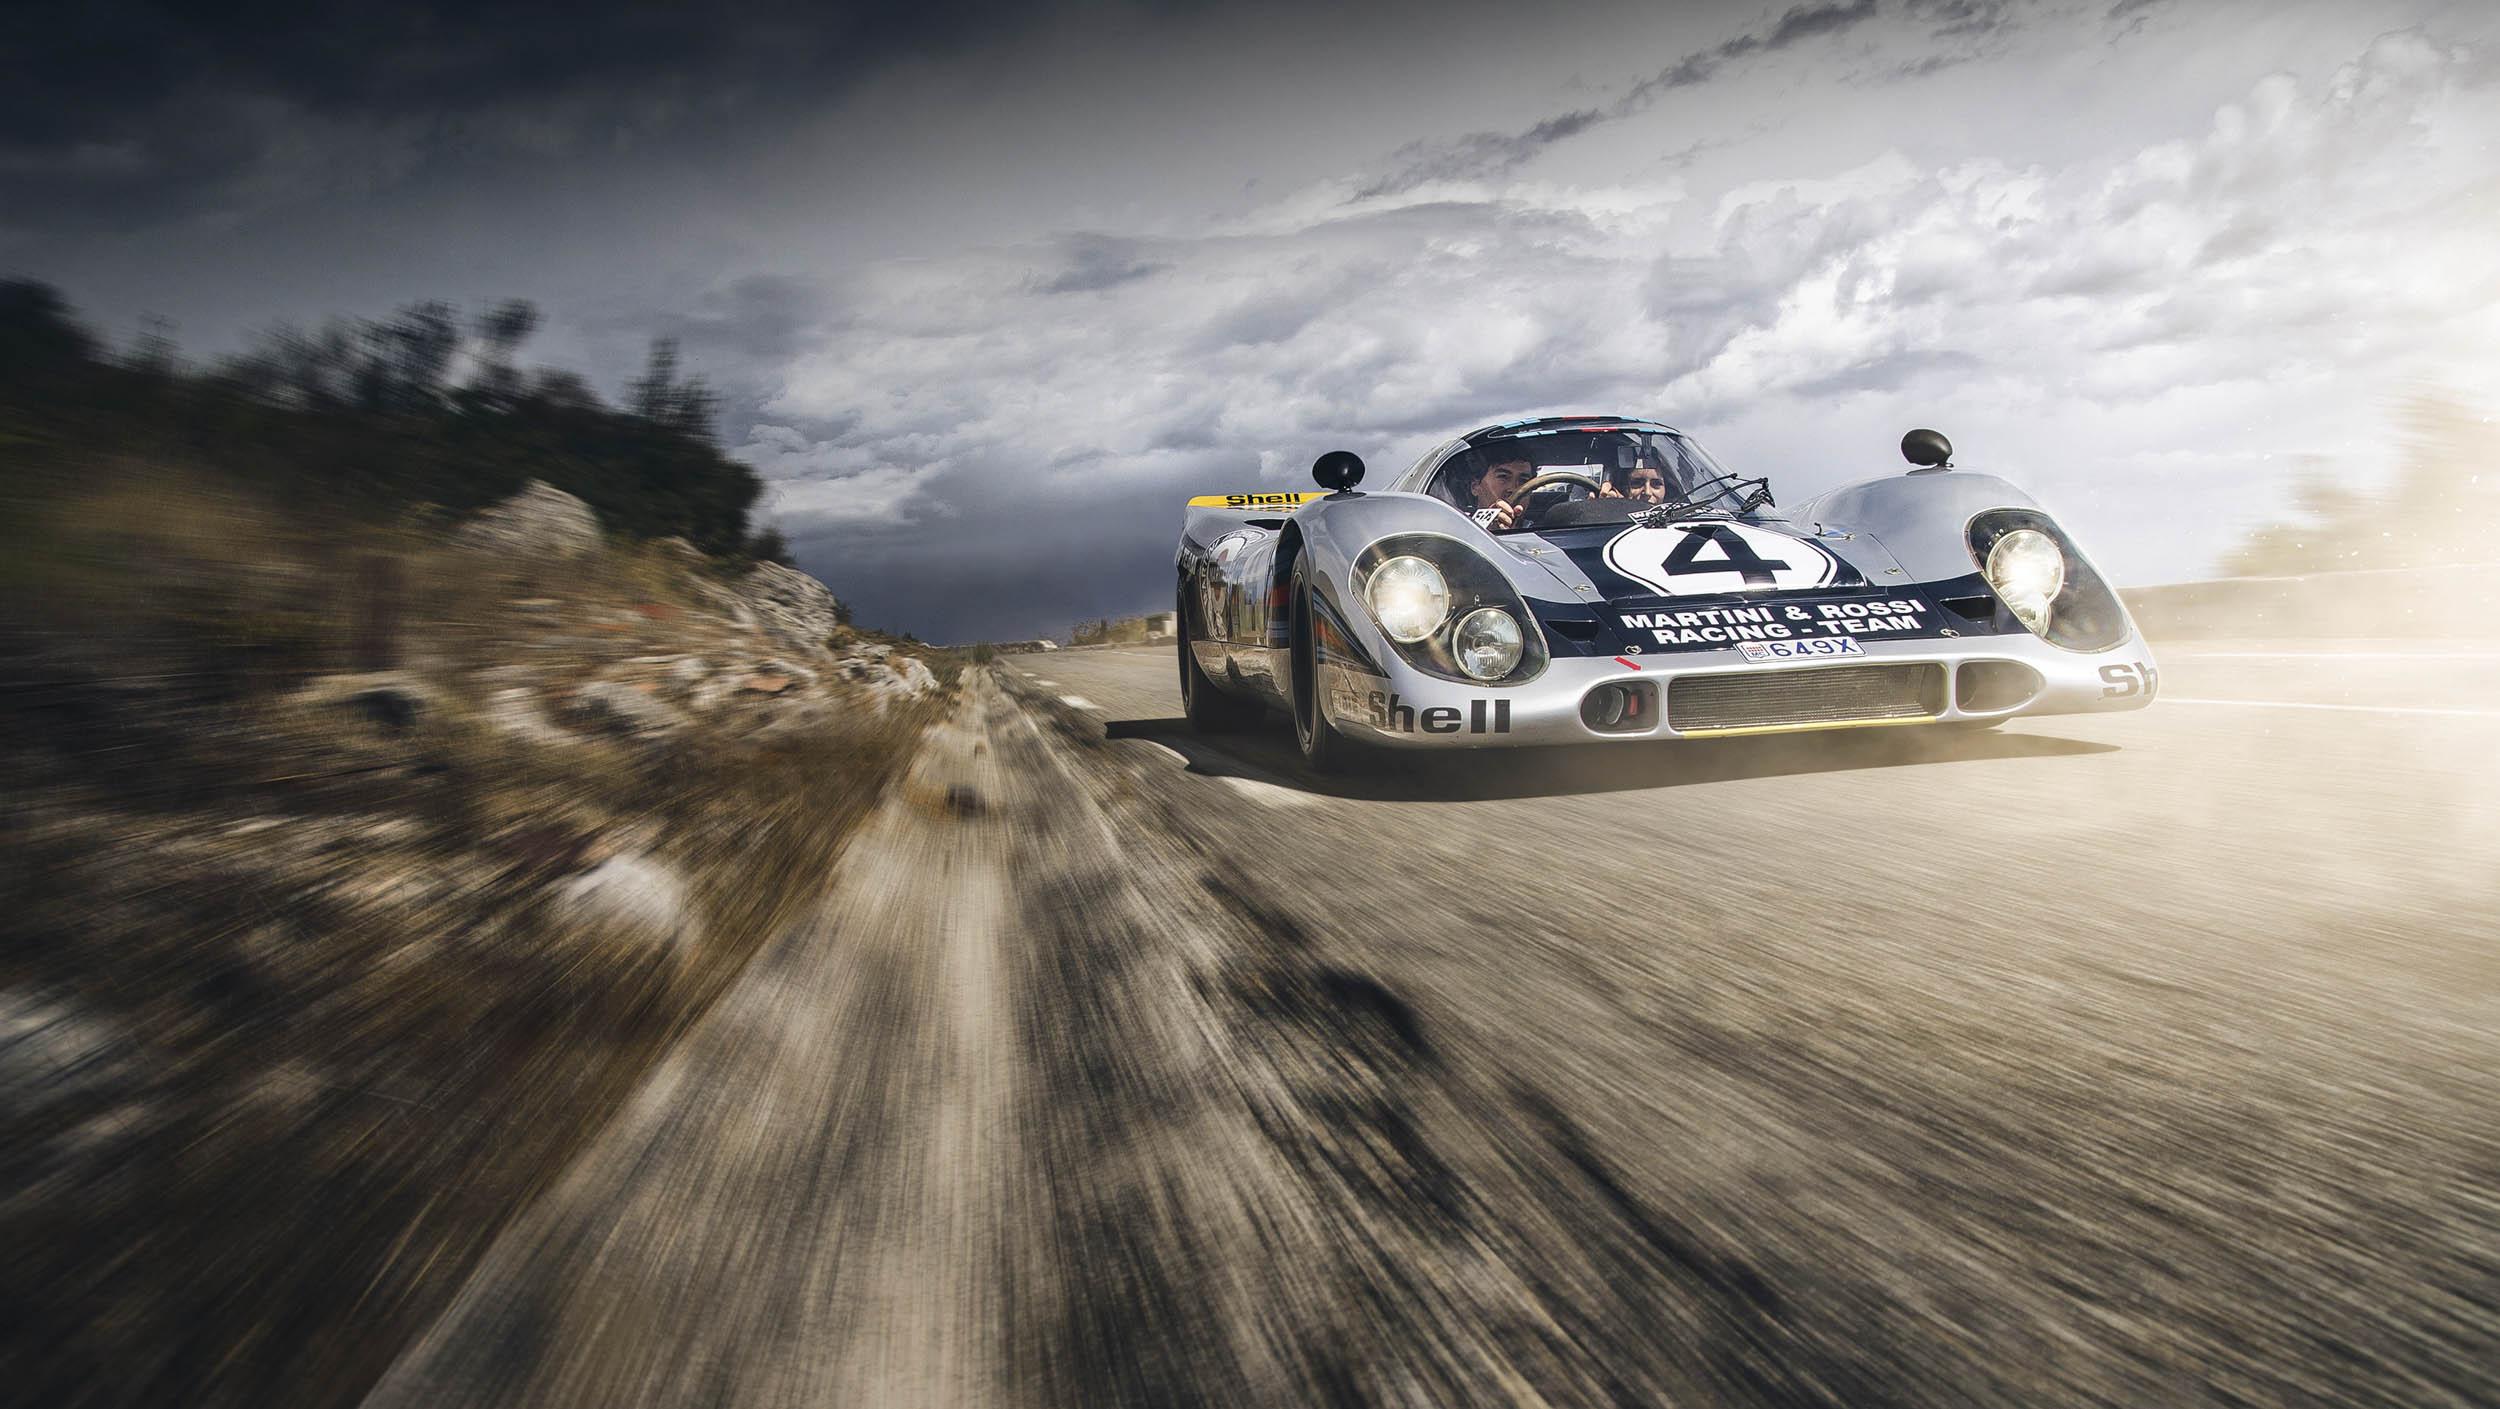 Porsche 917K driving on the highway